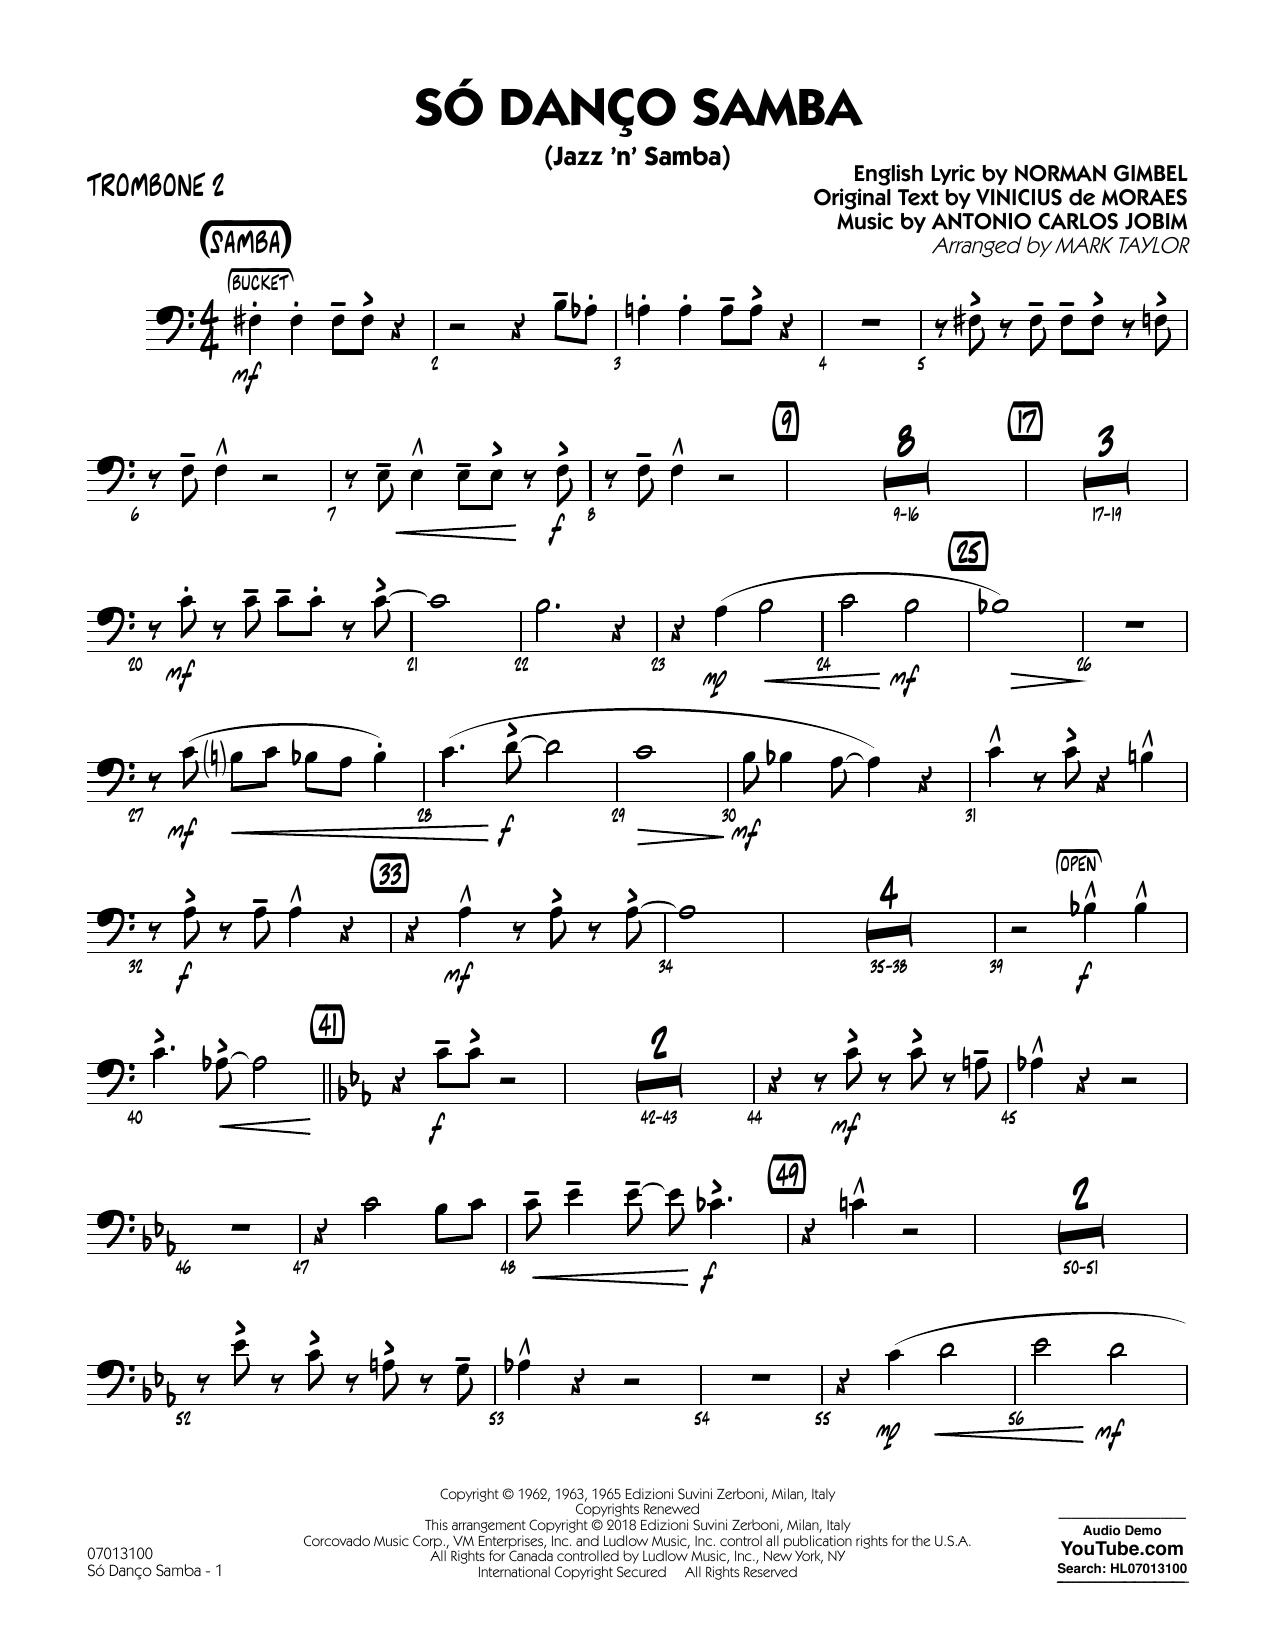 Antonio Carlos Jobim Só Danço Samba (Jazz 'n' Samba) (arr. Mark Taylor) - Trombone 2 sheet music notes and chords